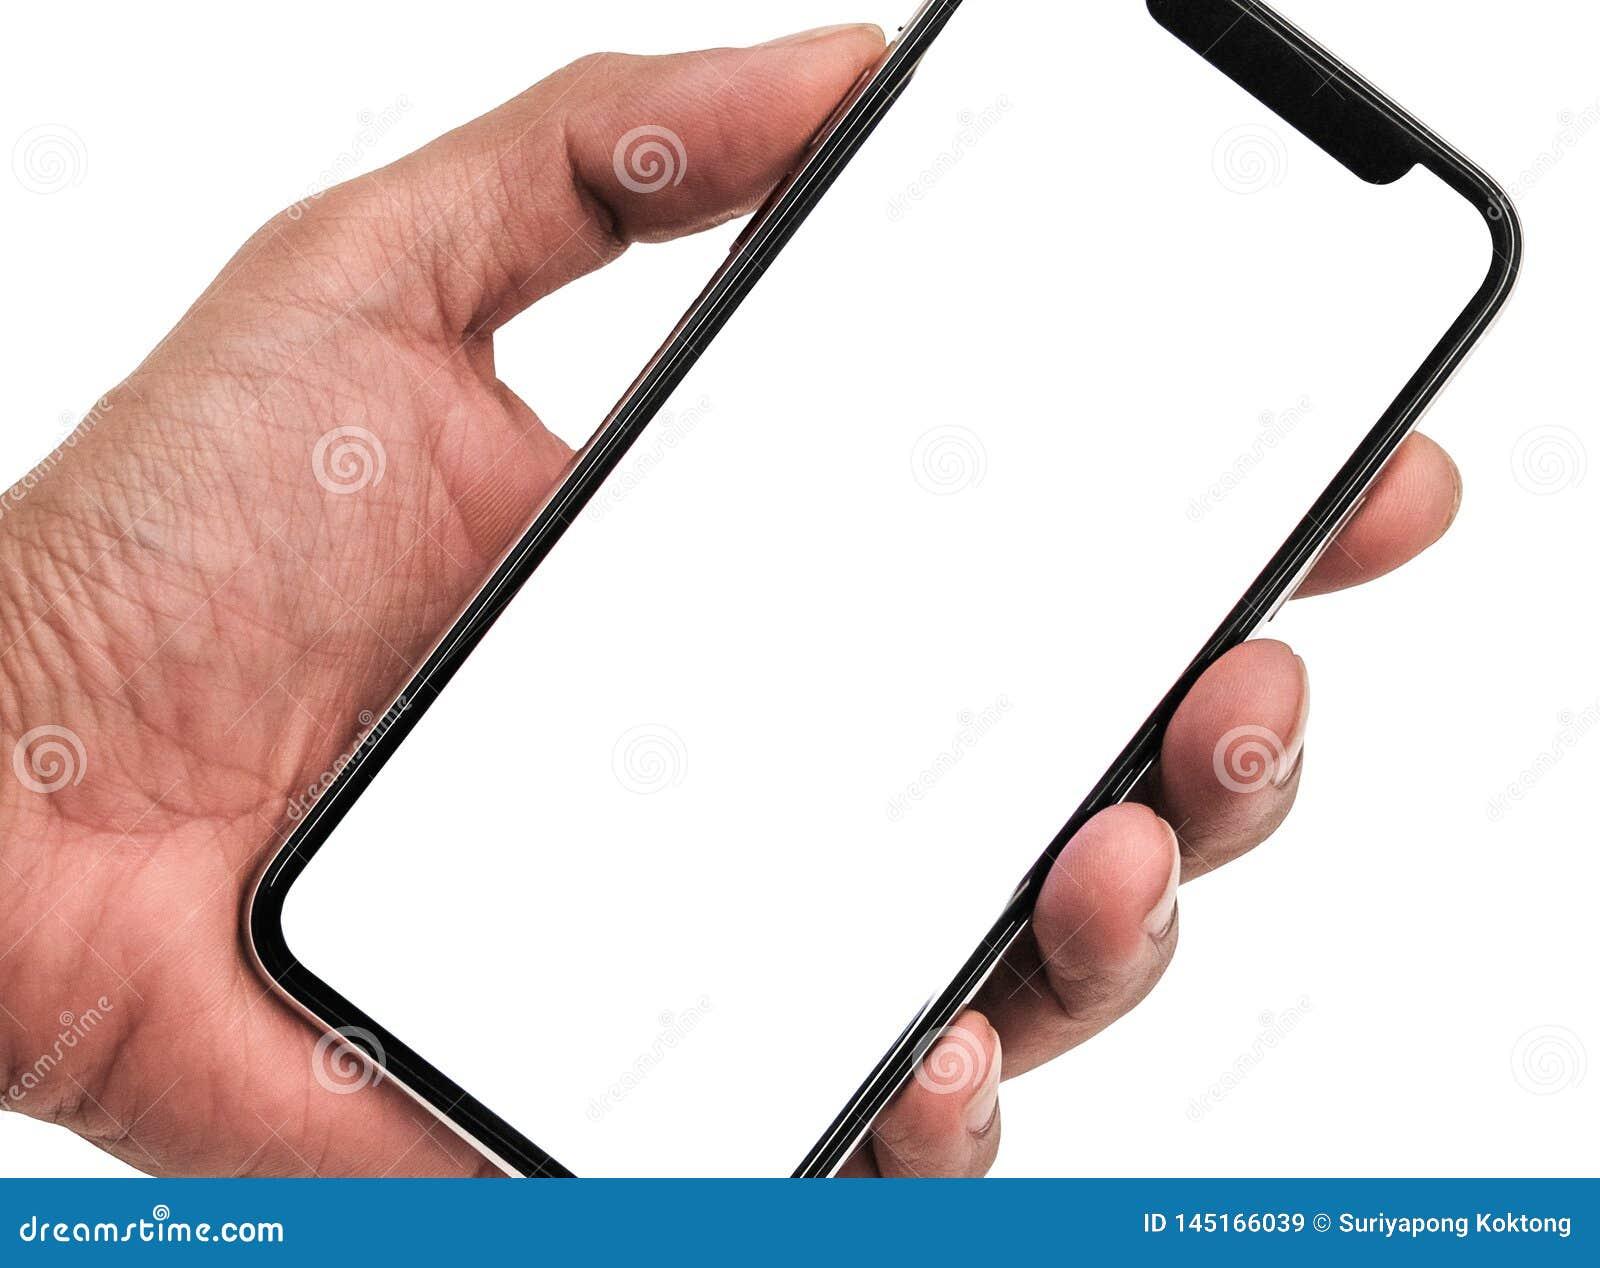 Hand Holding New Version Of Black Slim Smartphone Similar